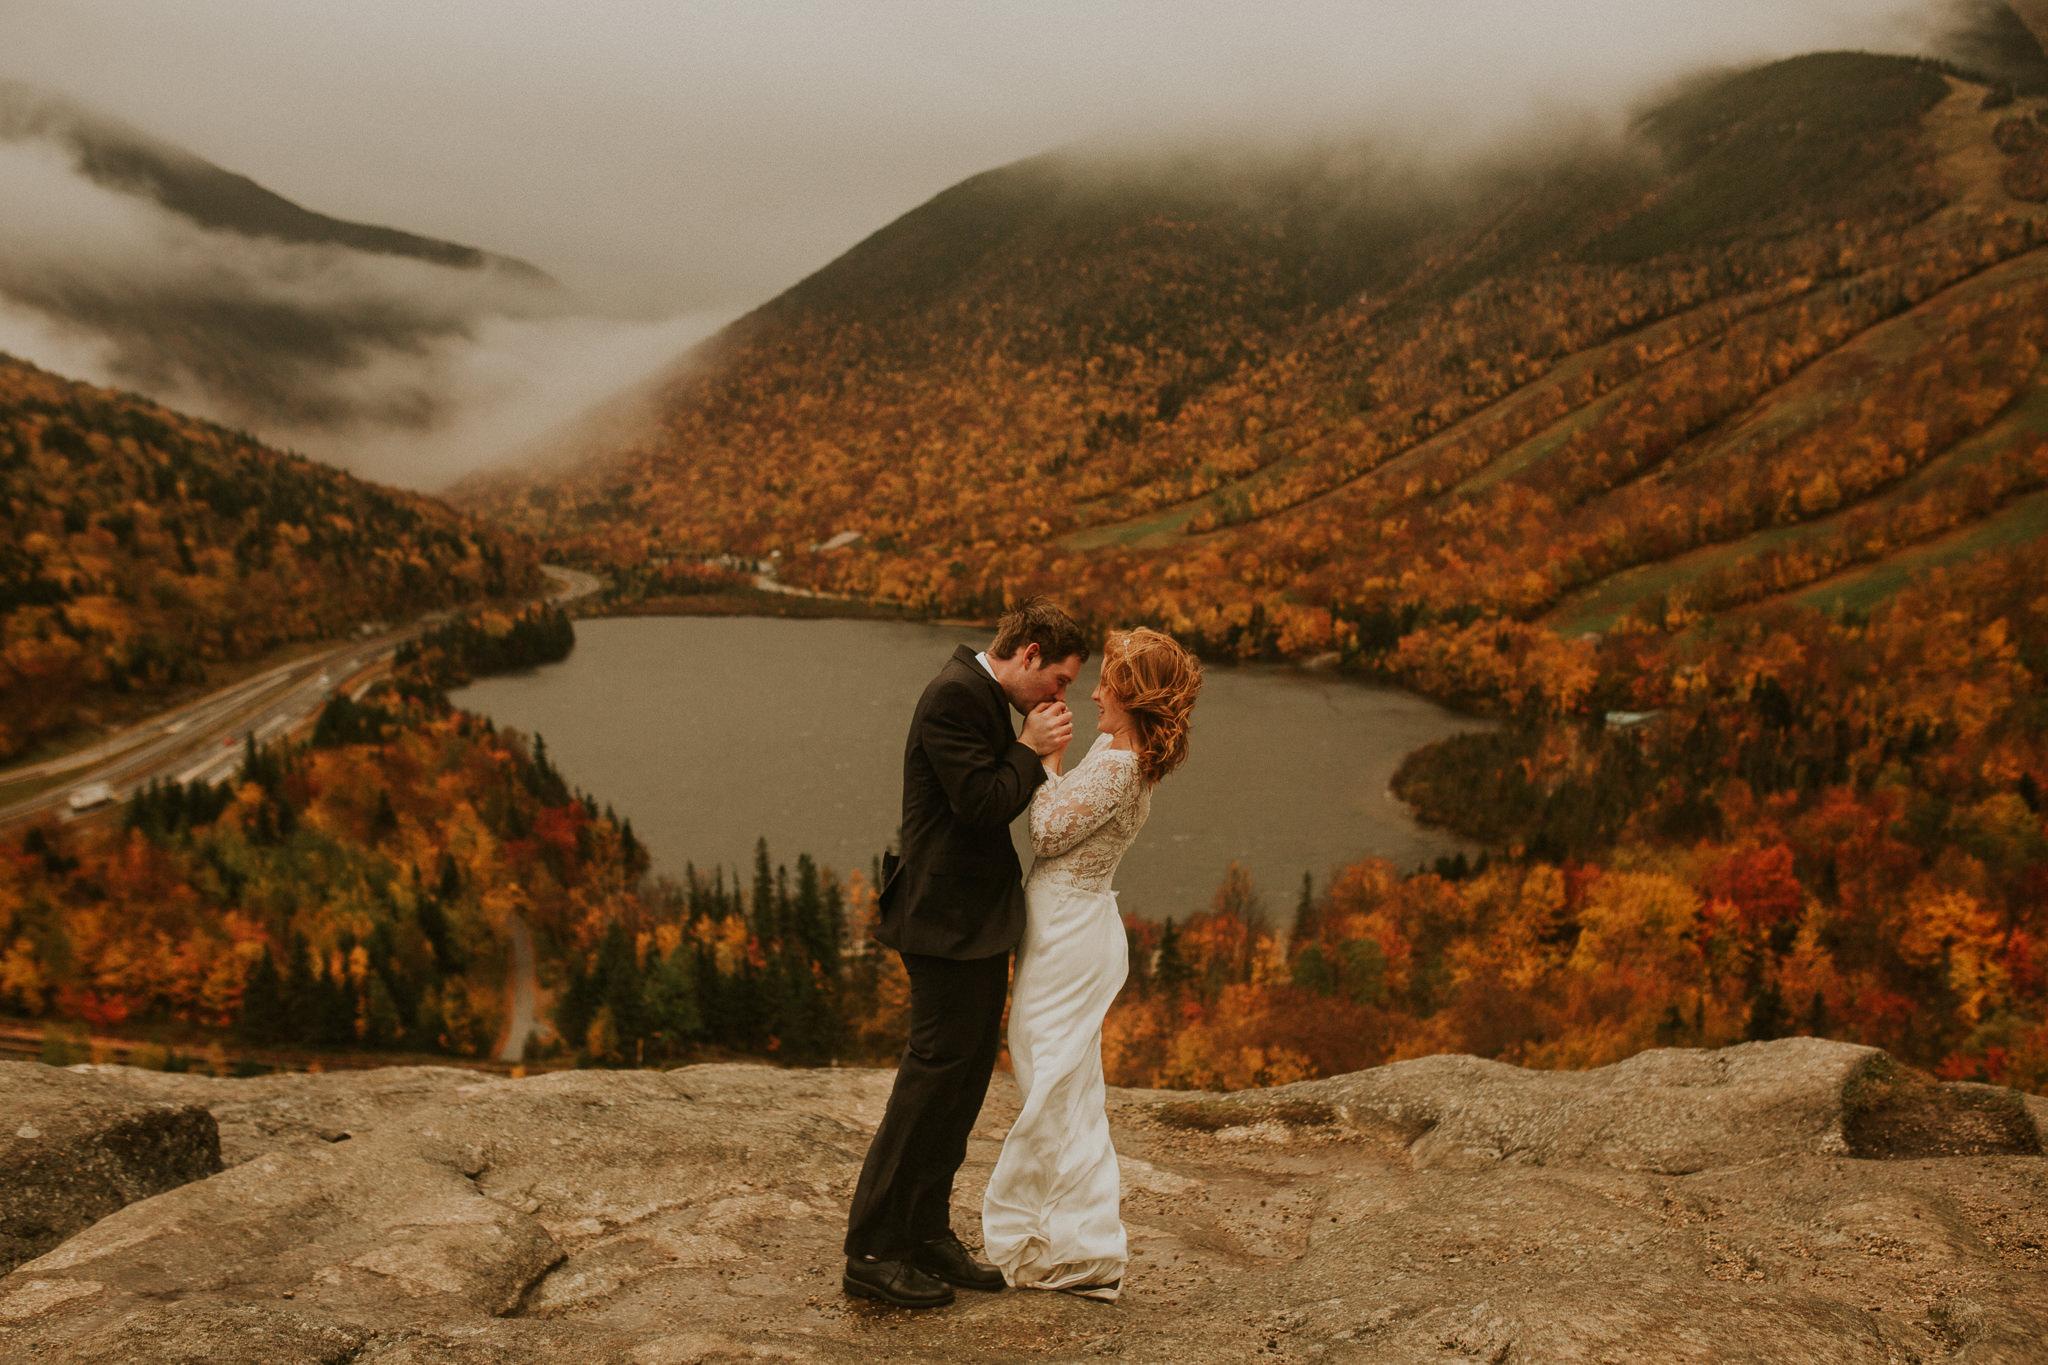 New hampshire elopement in Autumn